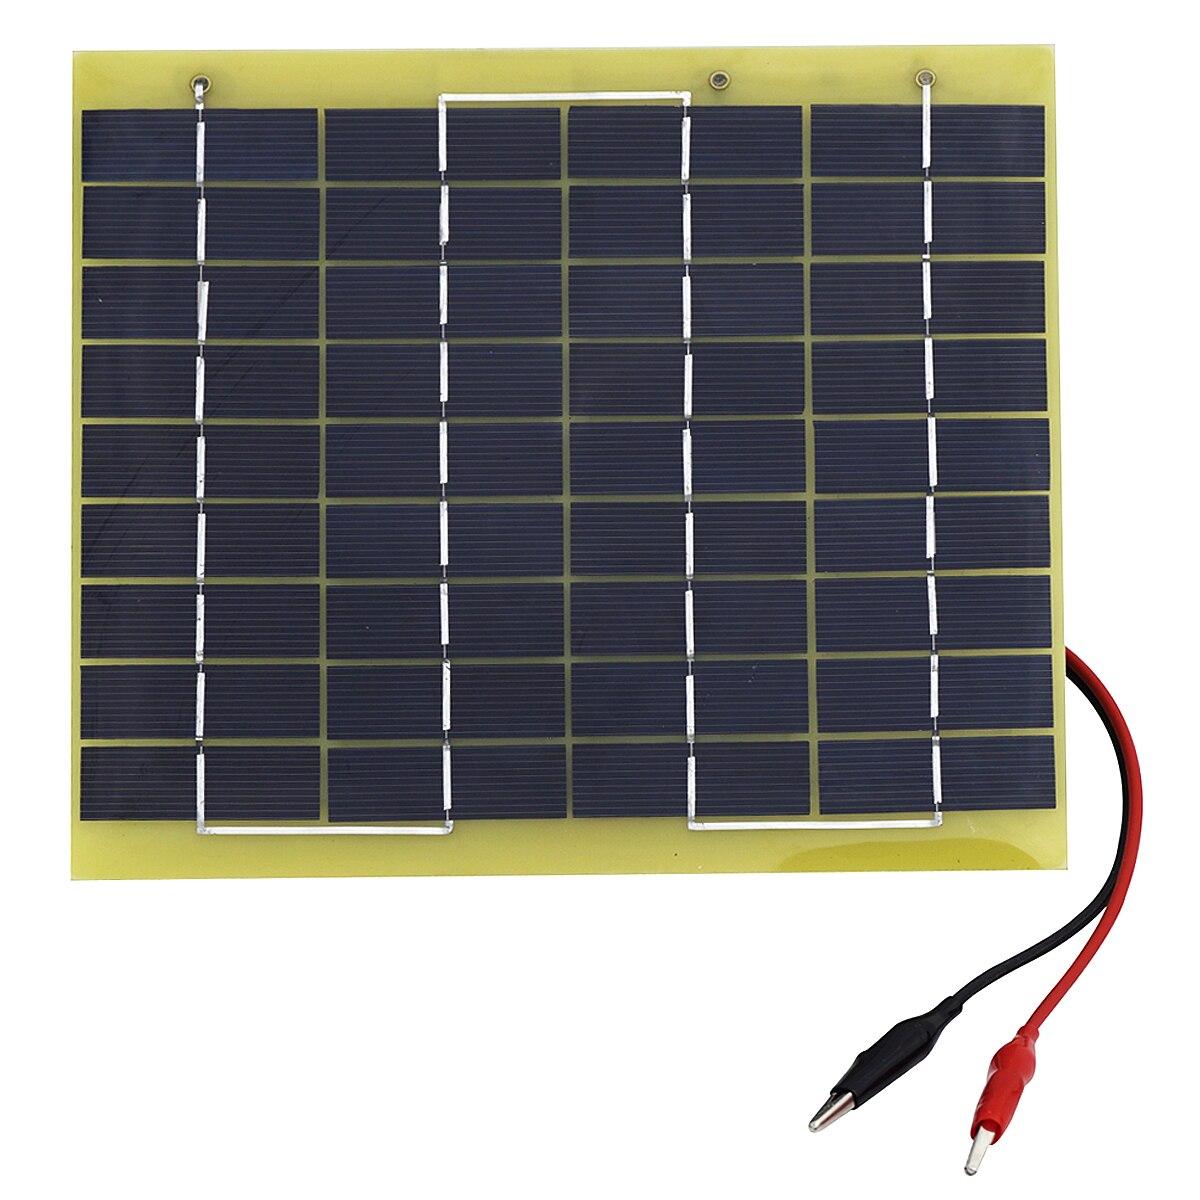 5W 12V Polycrystalline Poly Solar Cell panel for Diy Boat 12V Battery Charger Solar Panel poly 12V solarparts 2x 50w polycrystalline solar module by poly solar cell factory cheap selling 12v solar panel for rv marine boat use